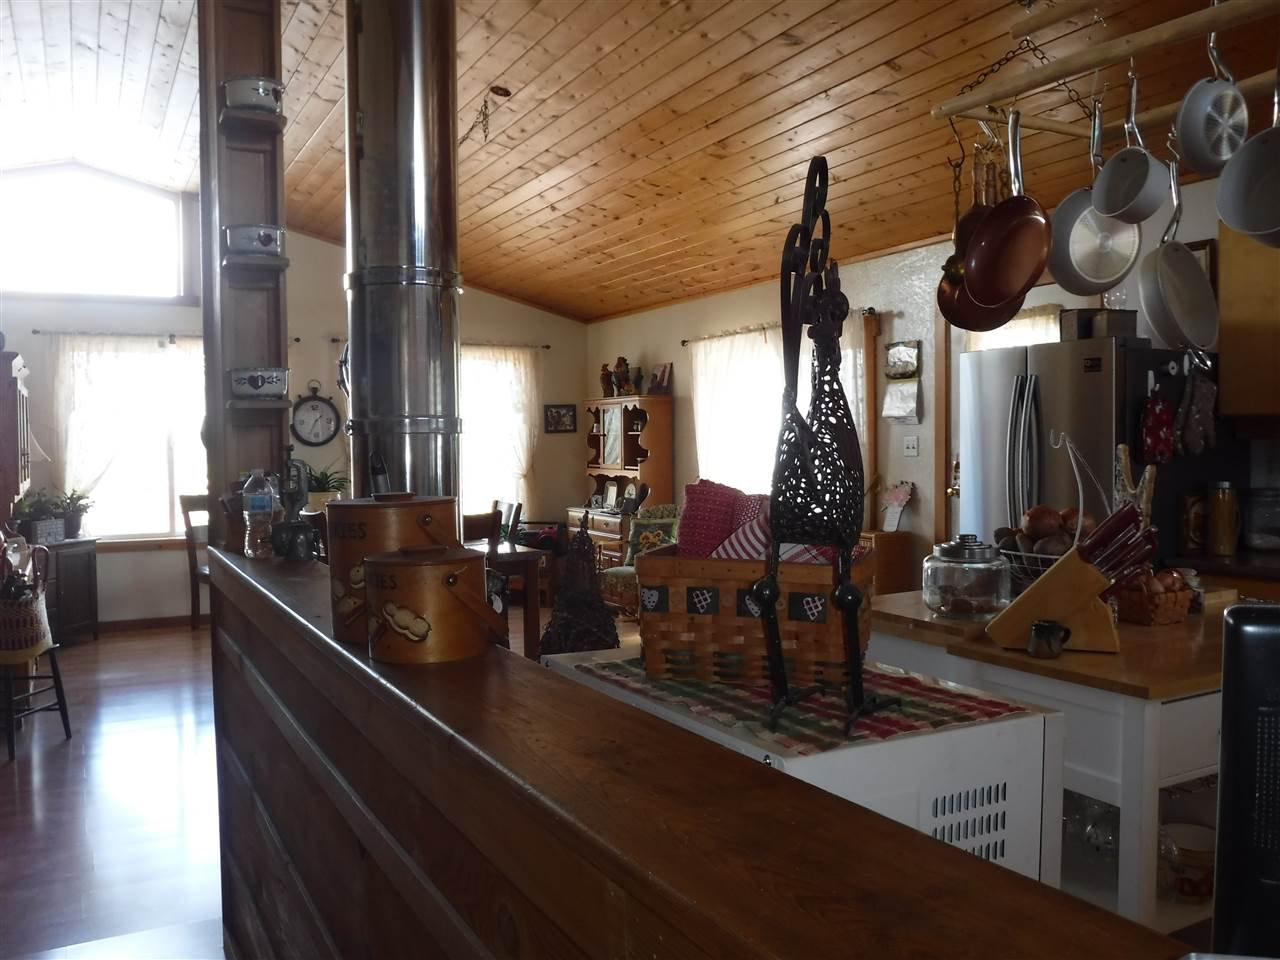 Photo 20: Photos: 3126 ELSEY Road in Williams Lake: Williams Lake - Rural West House for sale (Williams Lake (Zone 27))  : MLS®# R2467730